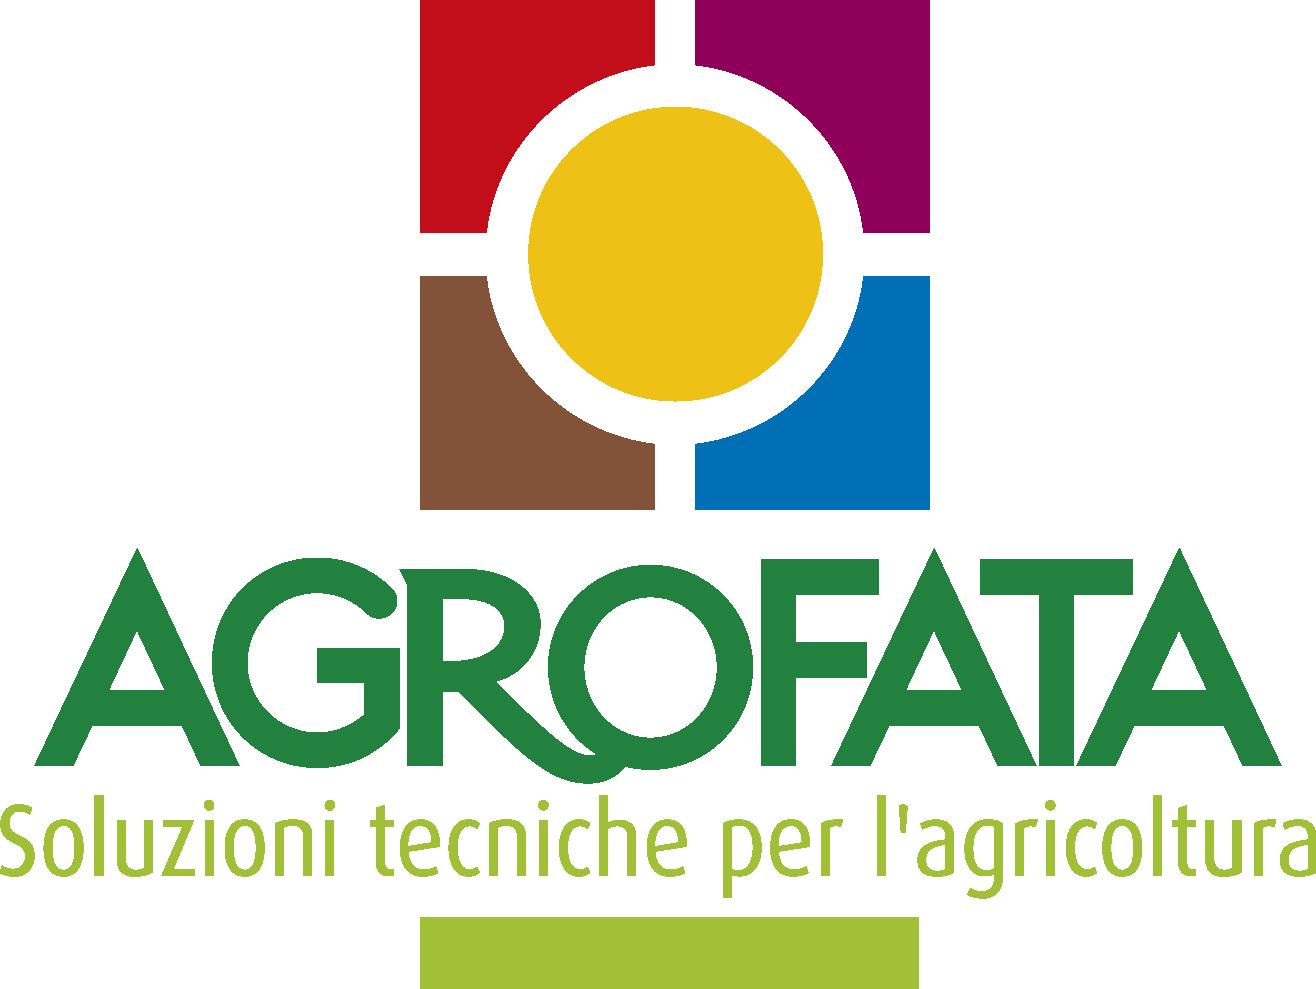 Agrofata